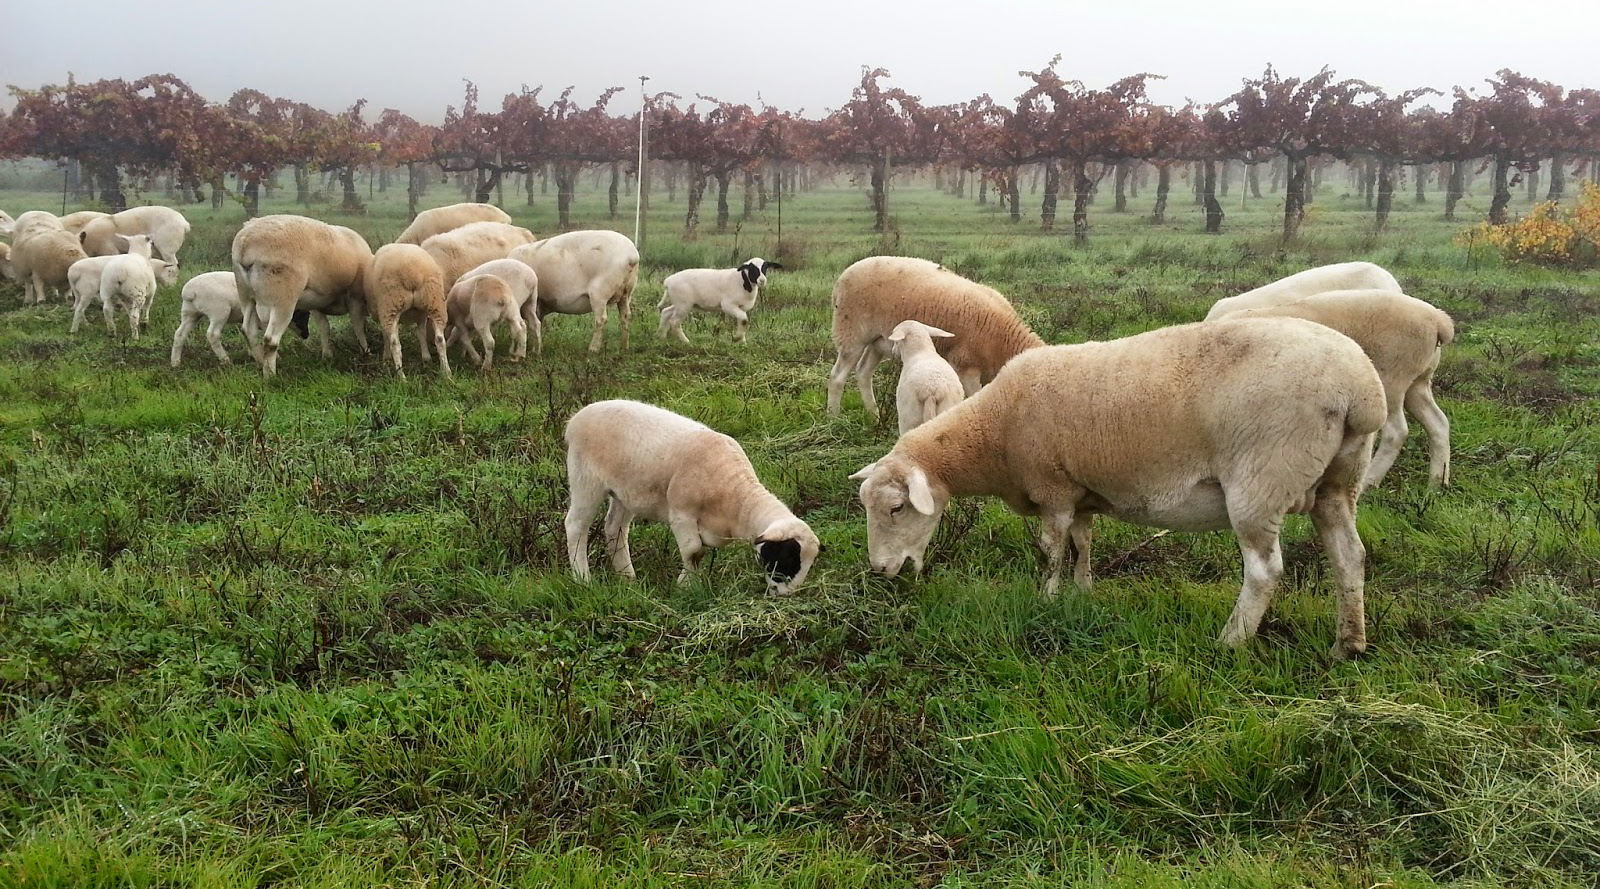 Sheep grazing in field.